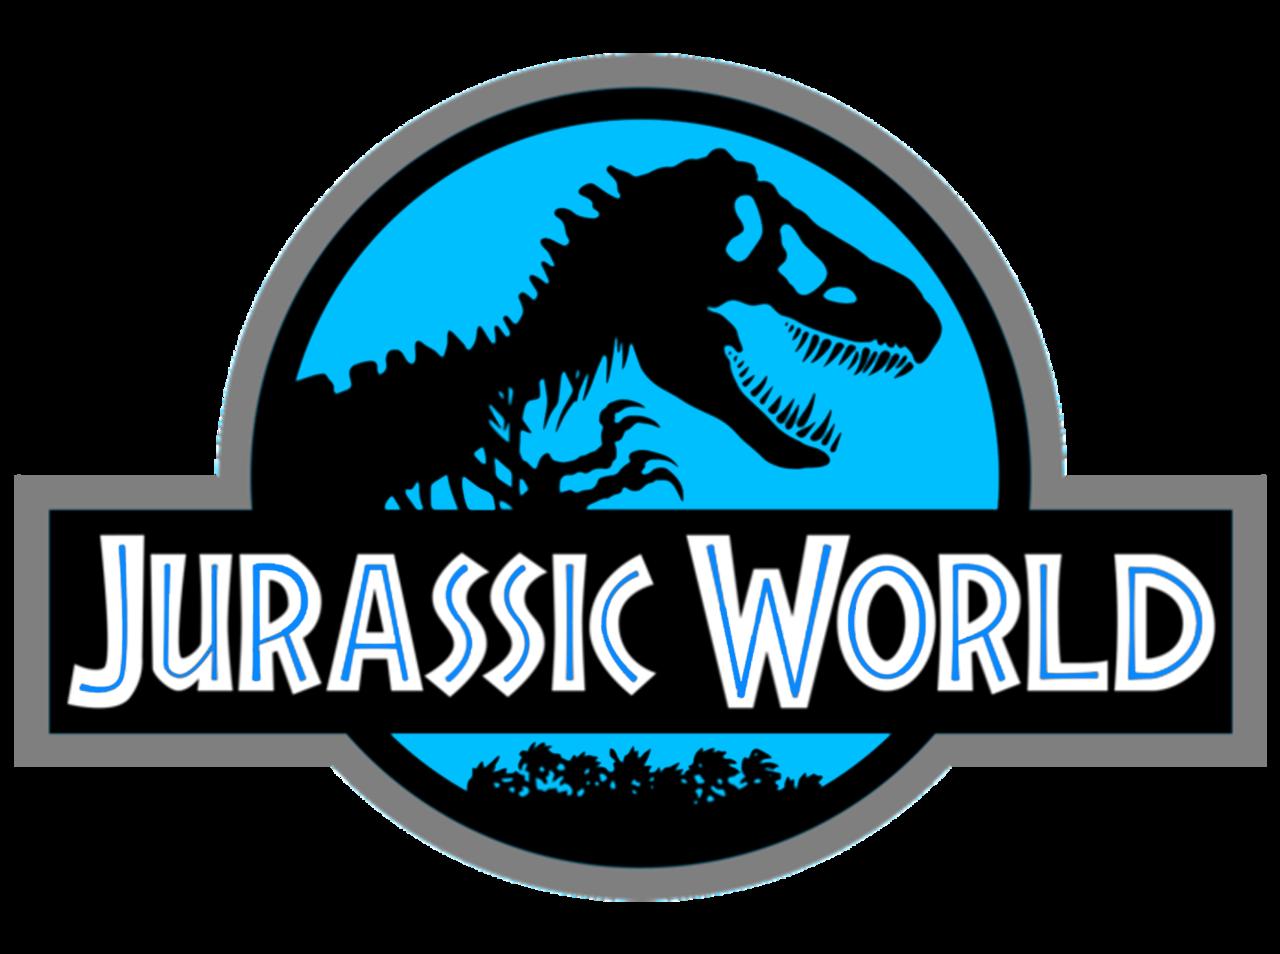 Gallery For > Jurassic World Logo Clipart.